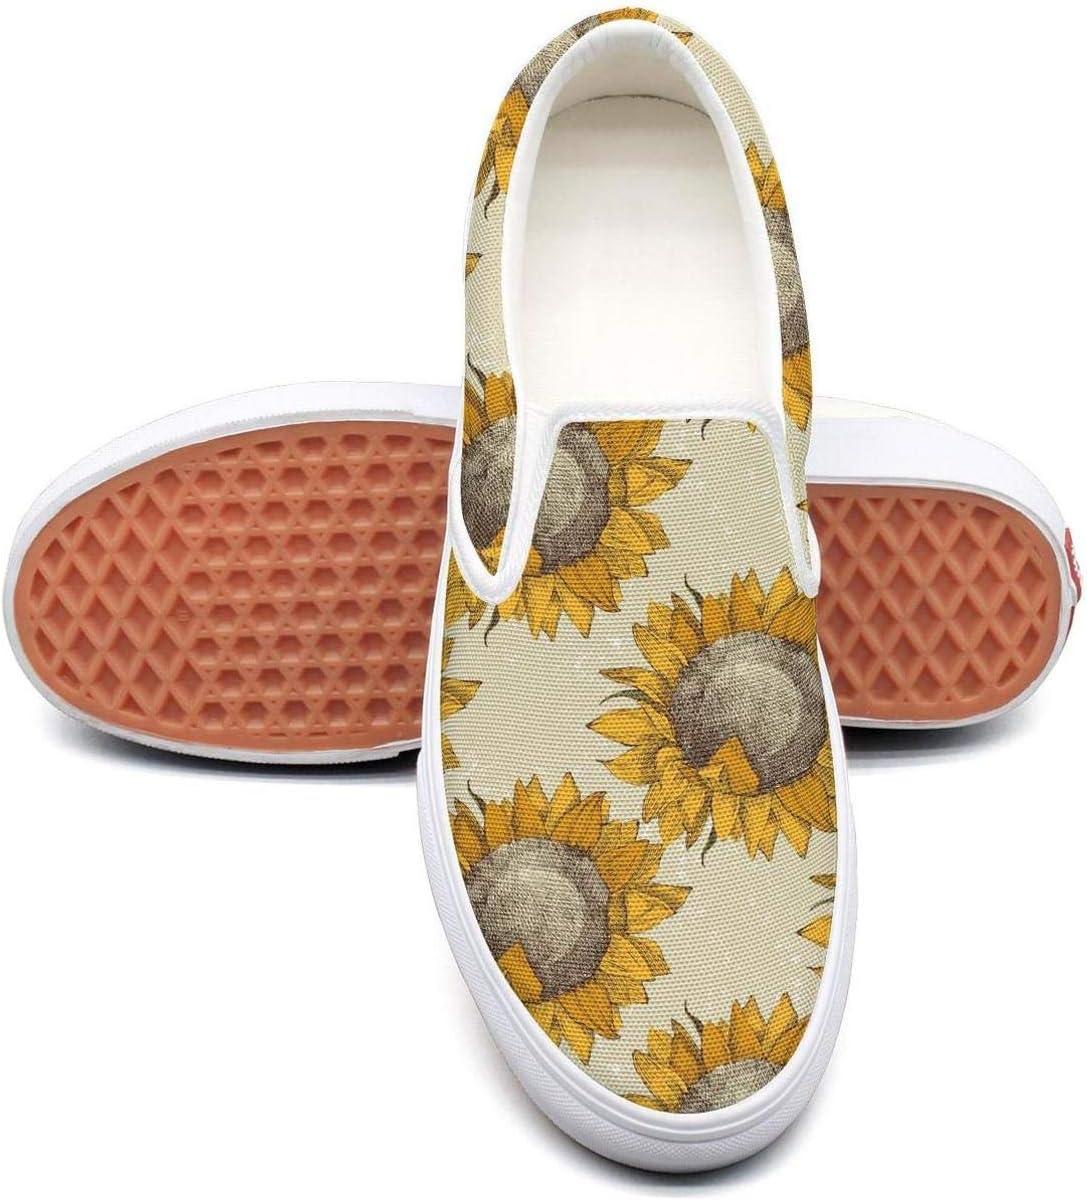 Vintage Sunflowers Classic Canvas Shoes Slip On Skate Sneakers Women Fashion Print Original Durable